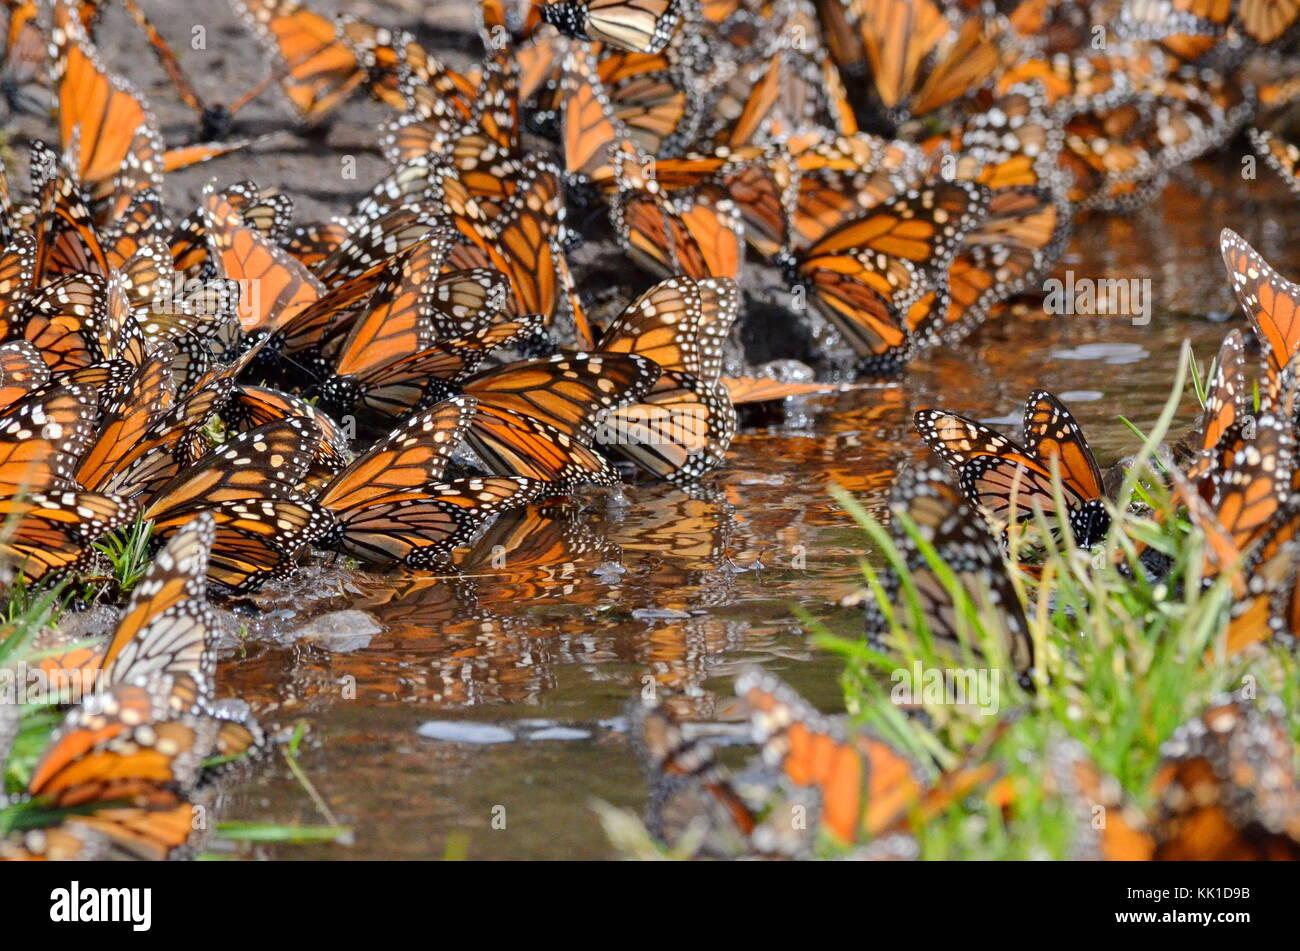 Monarch Butterflies drinking at creek, danaus plexippus, Michoacan, Mexico - Stock Image